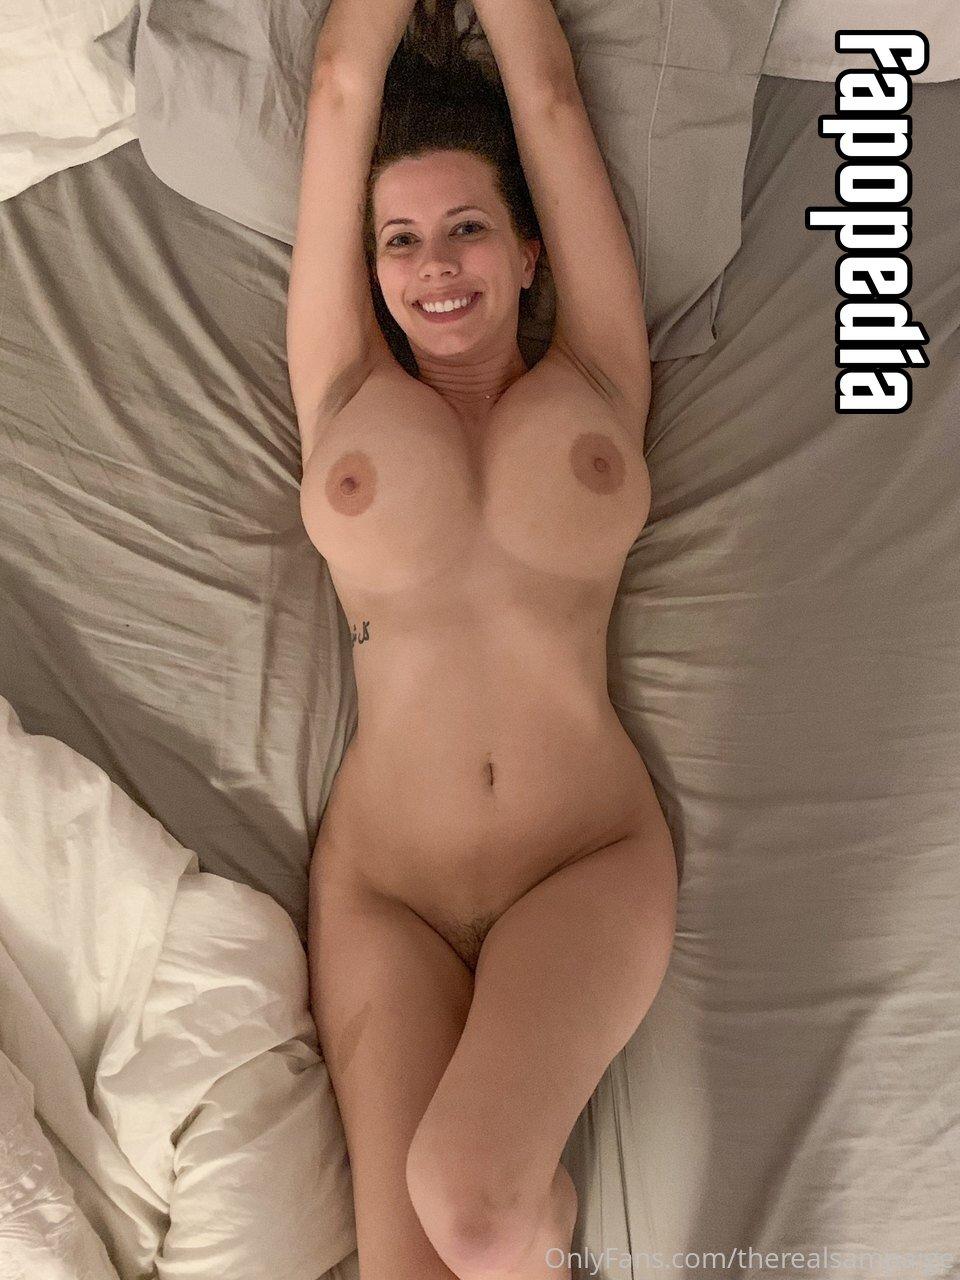 Sam Paige Nude OnlyFans Leaks